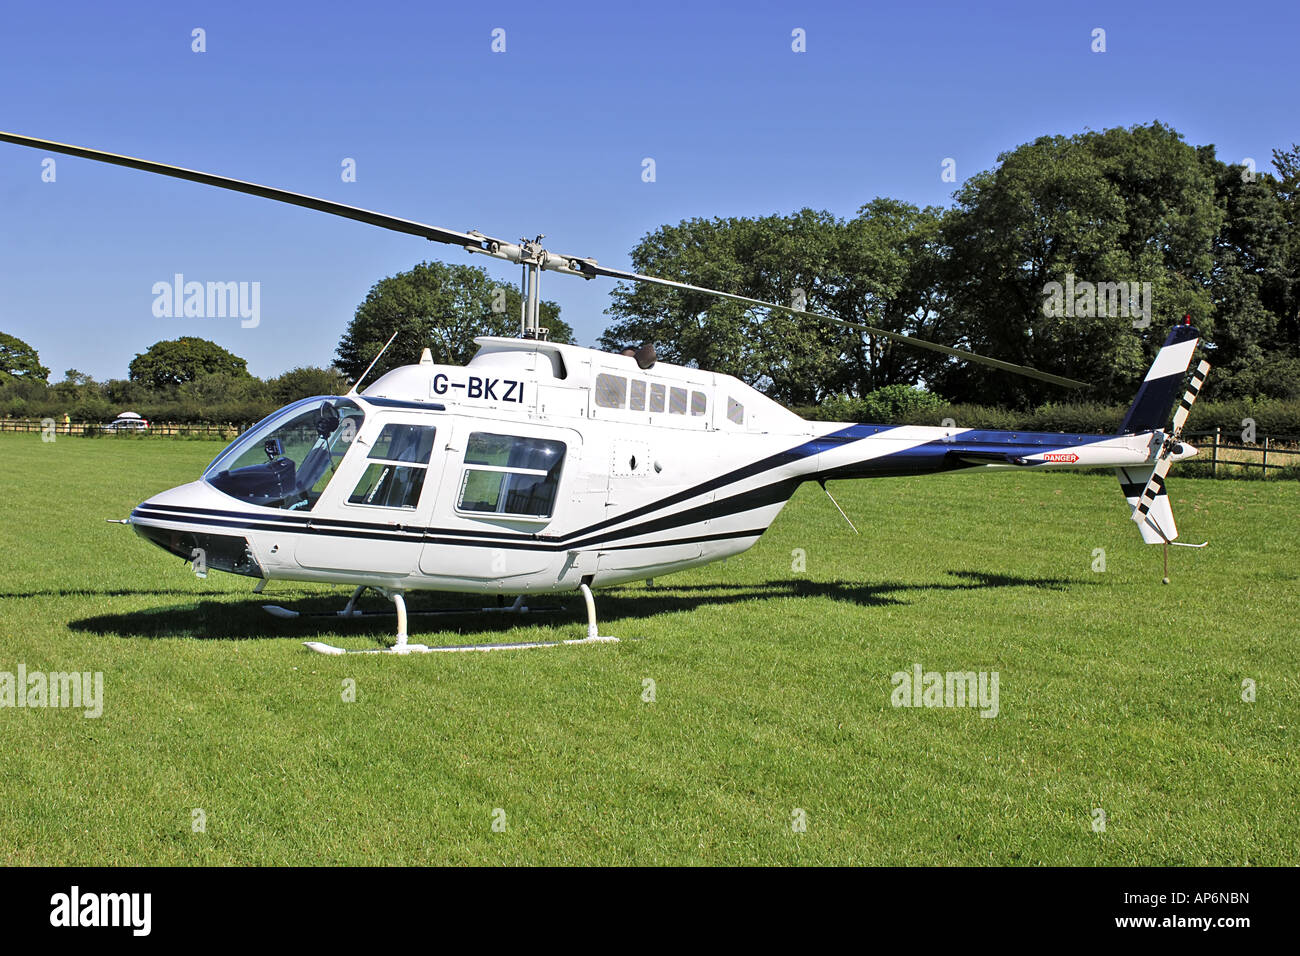 Elicottero Jet Ranger : G bkzi bell b jetranger ii elicottero foto immagine stock